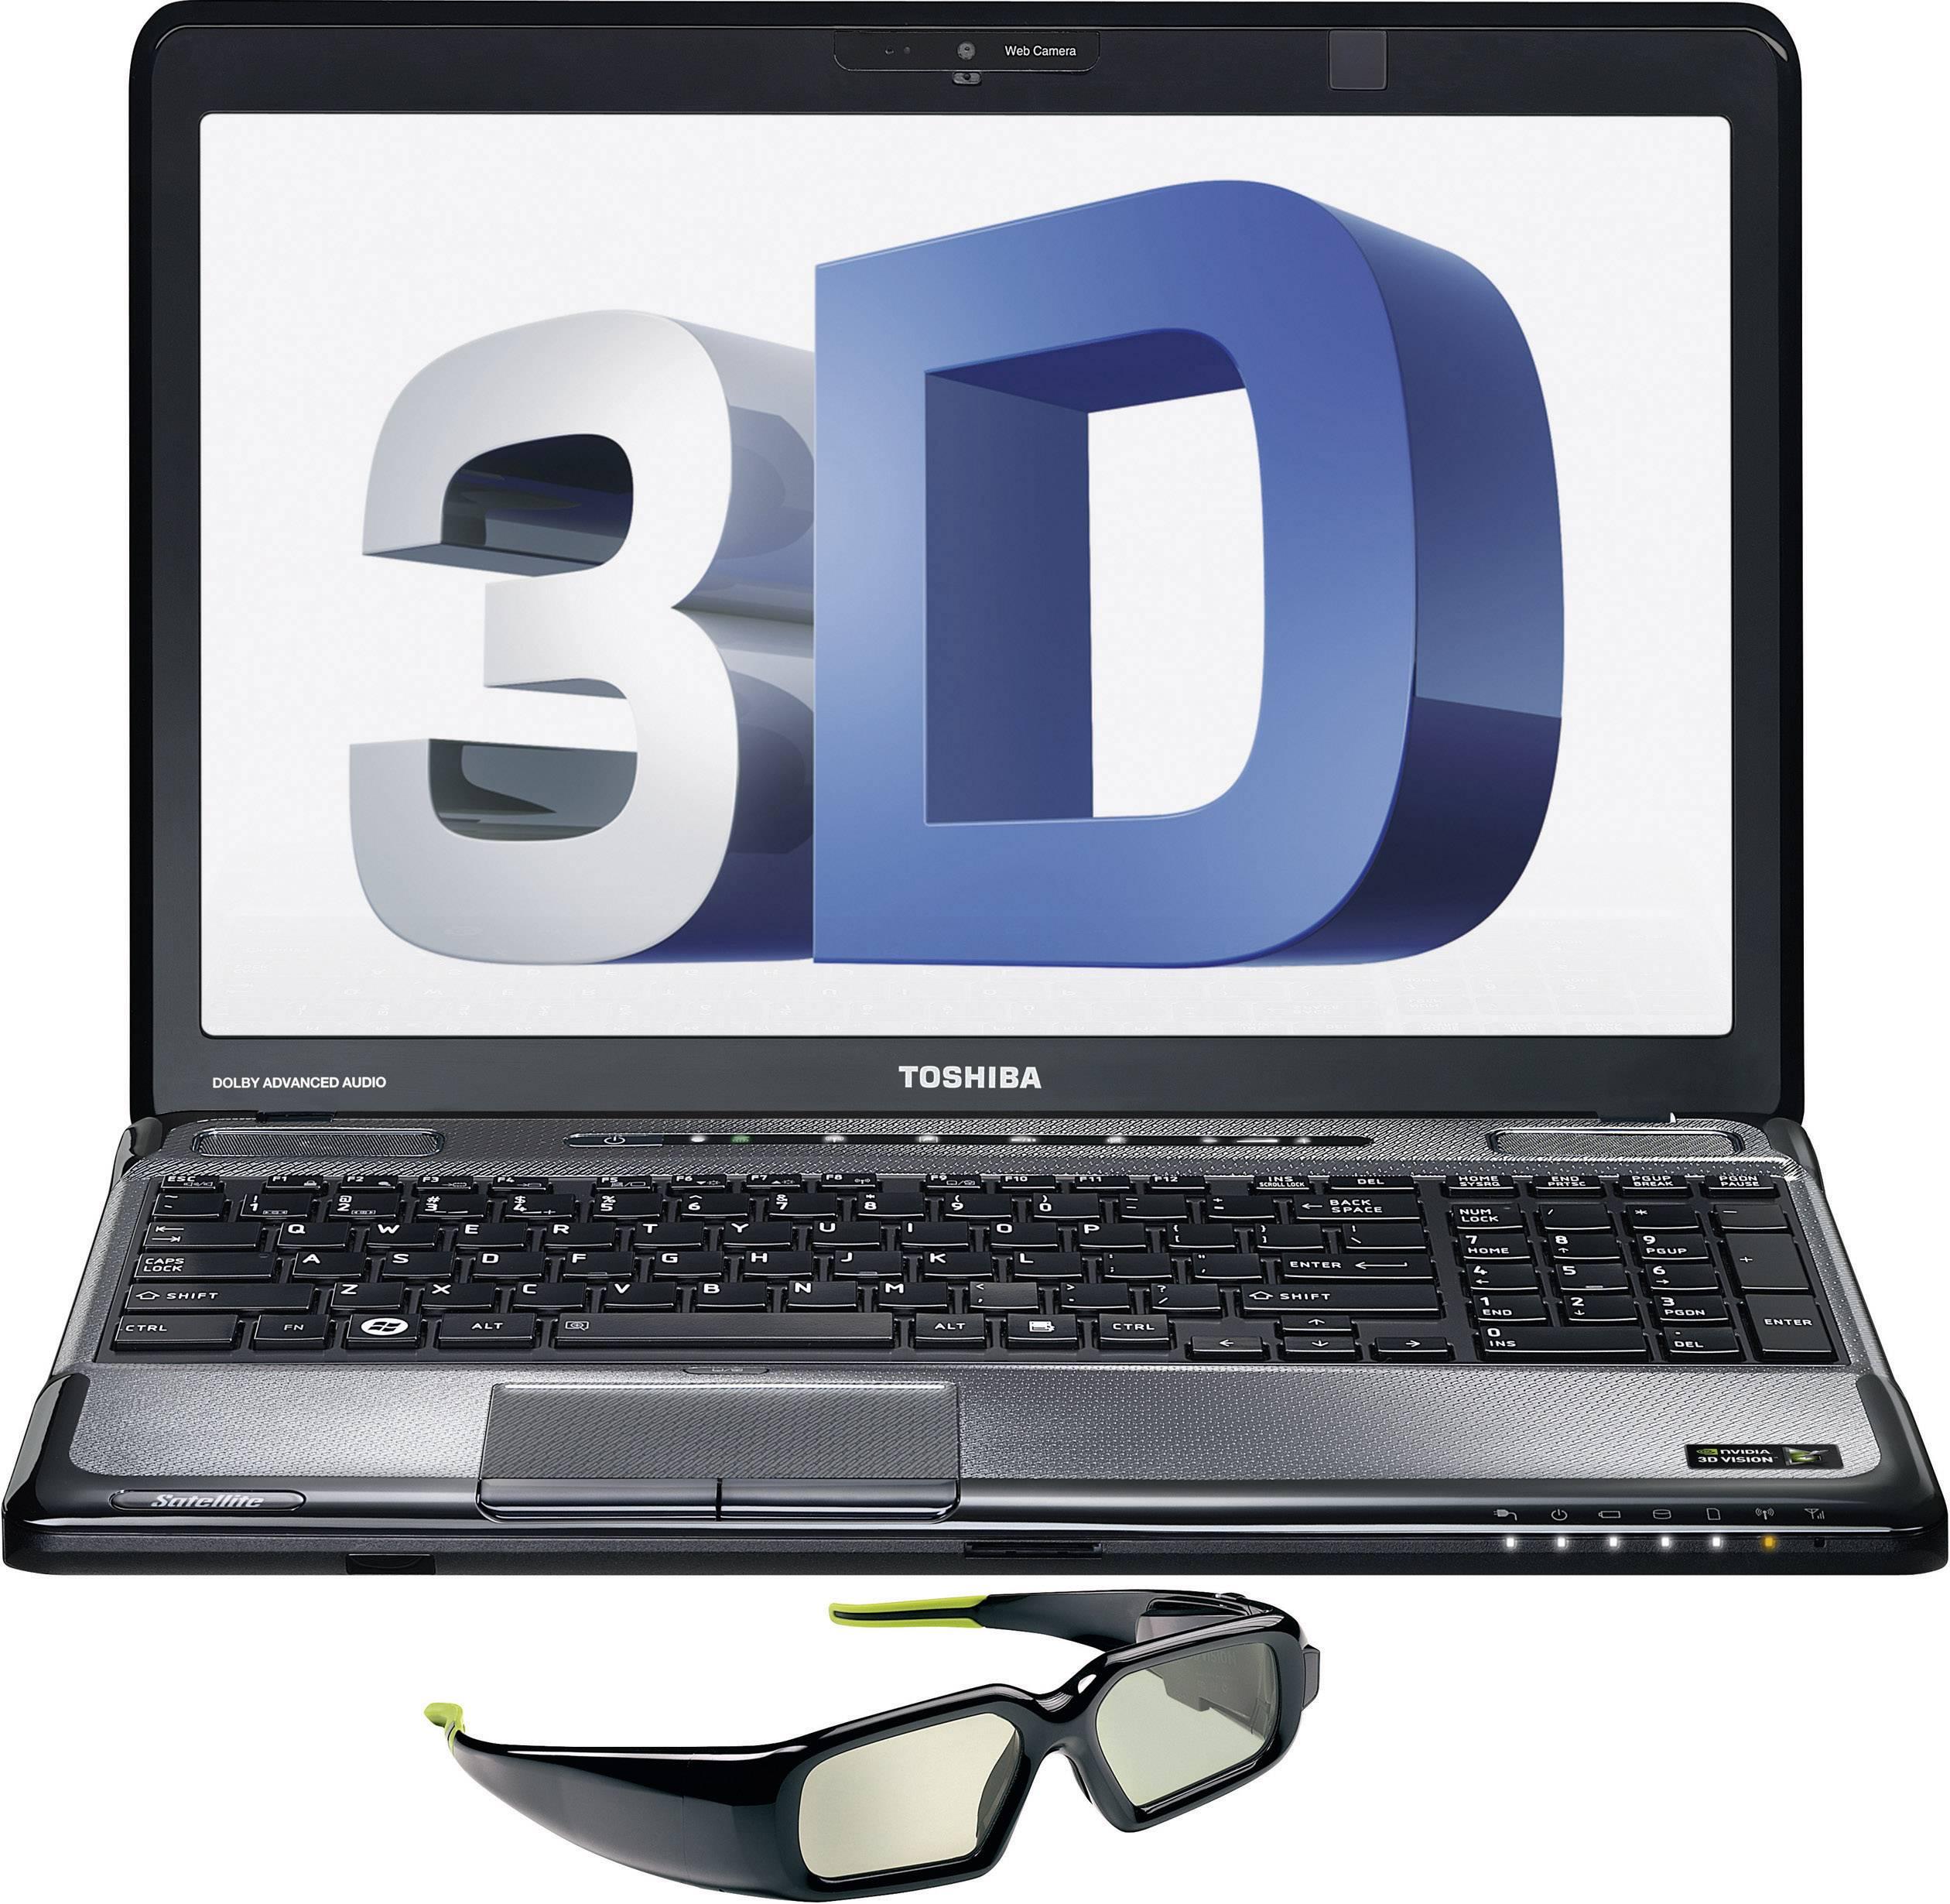 3D fähige Notebooks